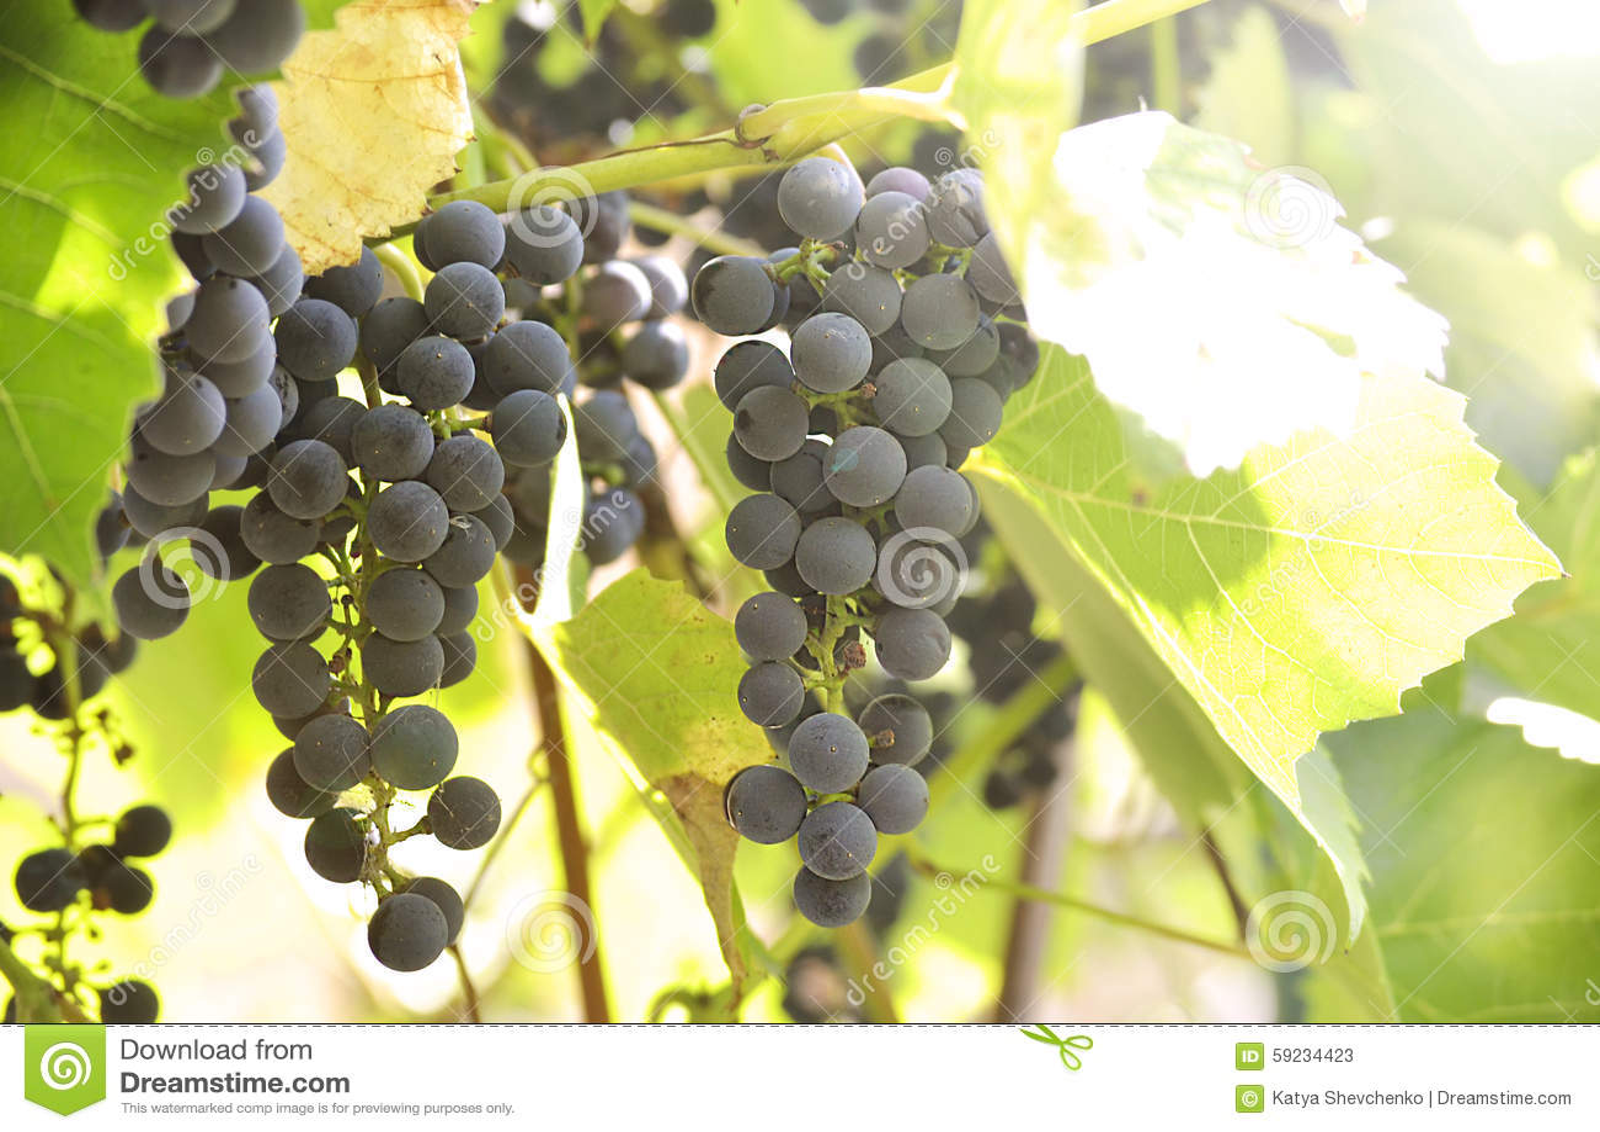 Download Manojo de uvas imagen de archivo. Imagen de vendimia - 59234423